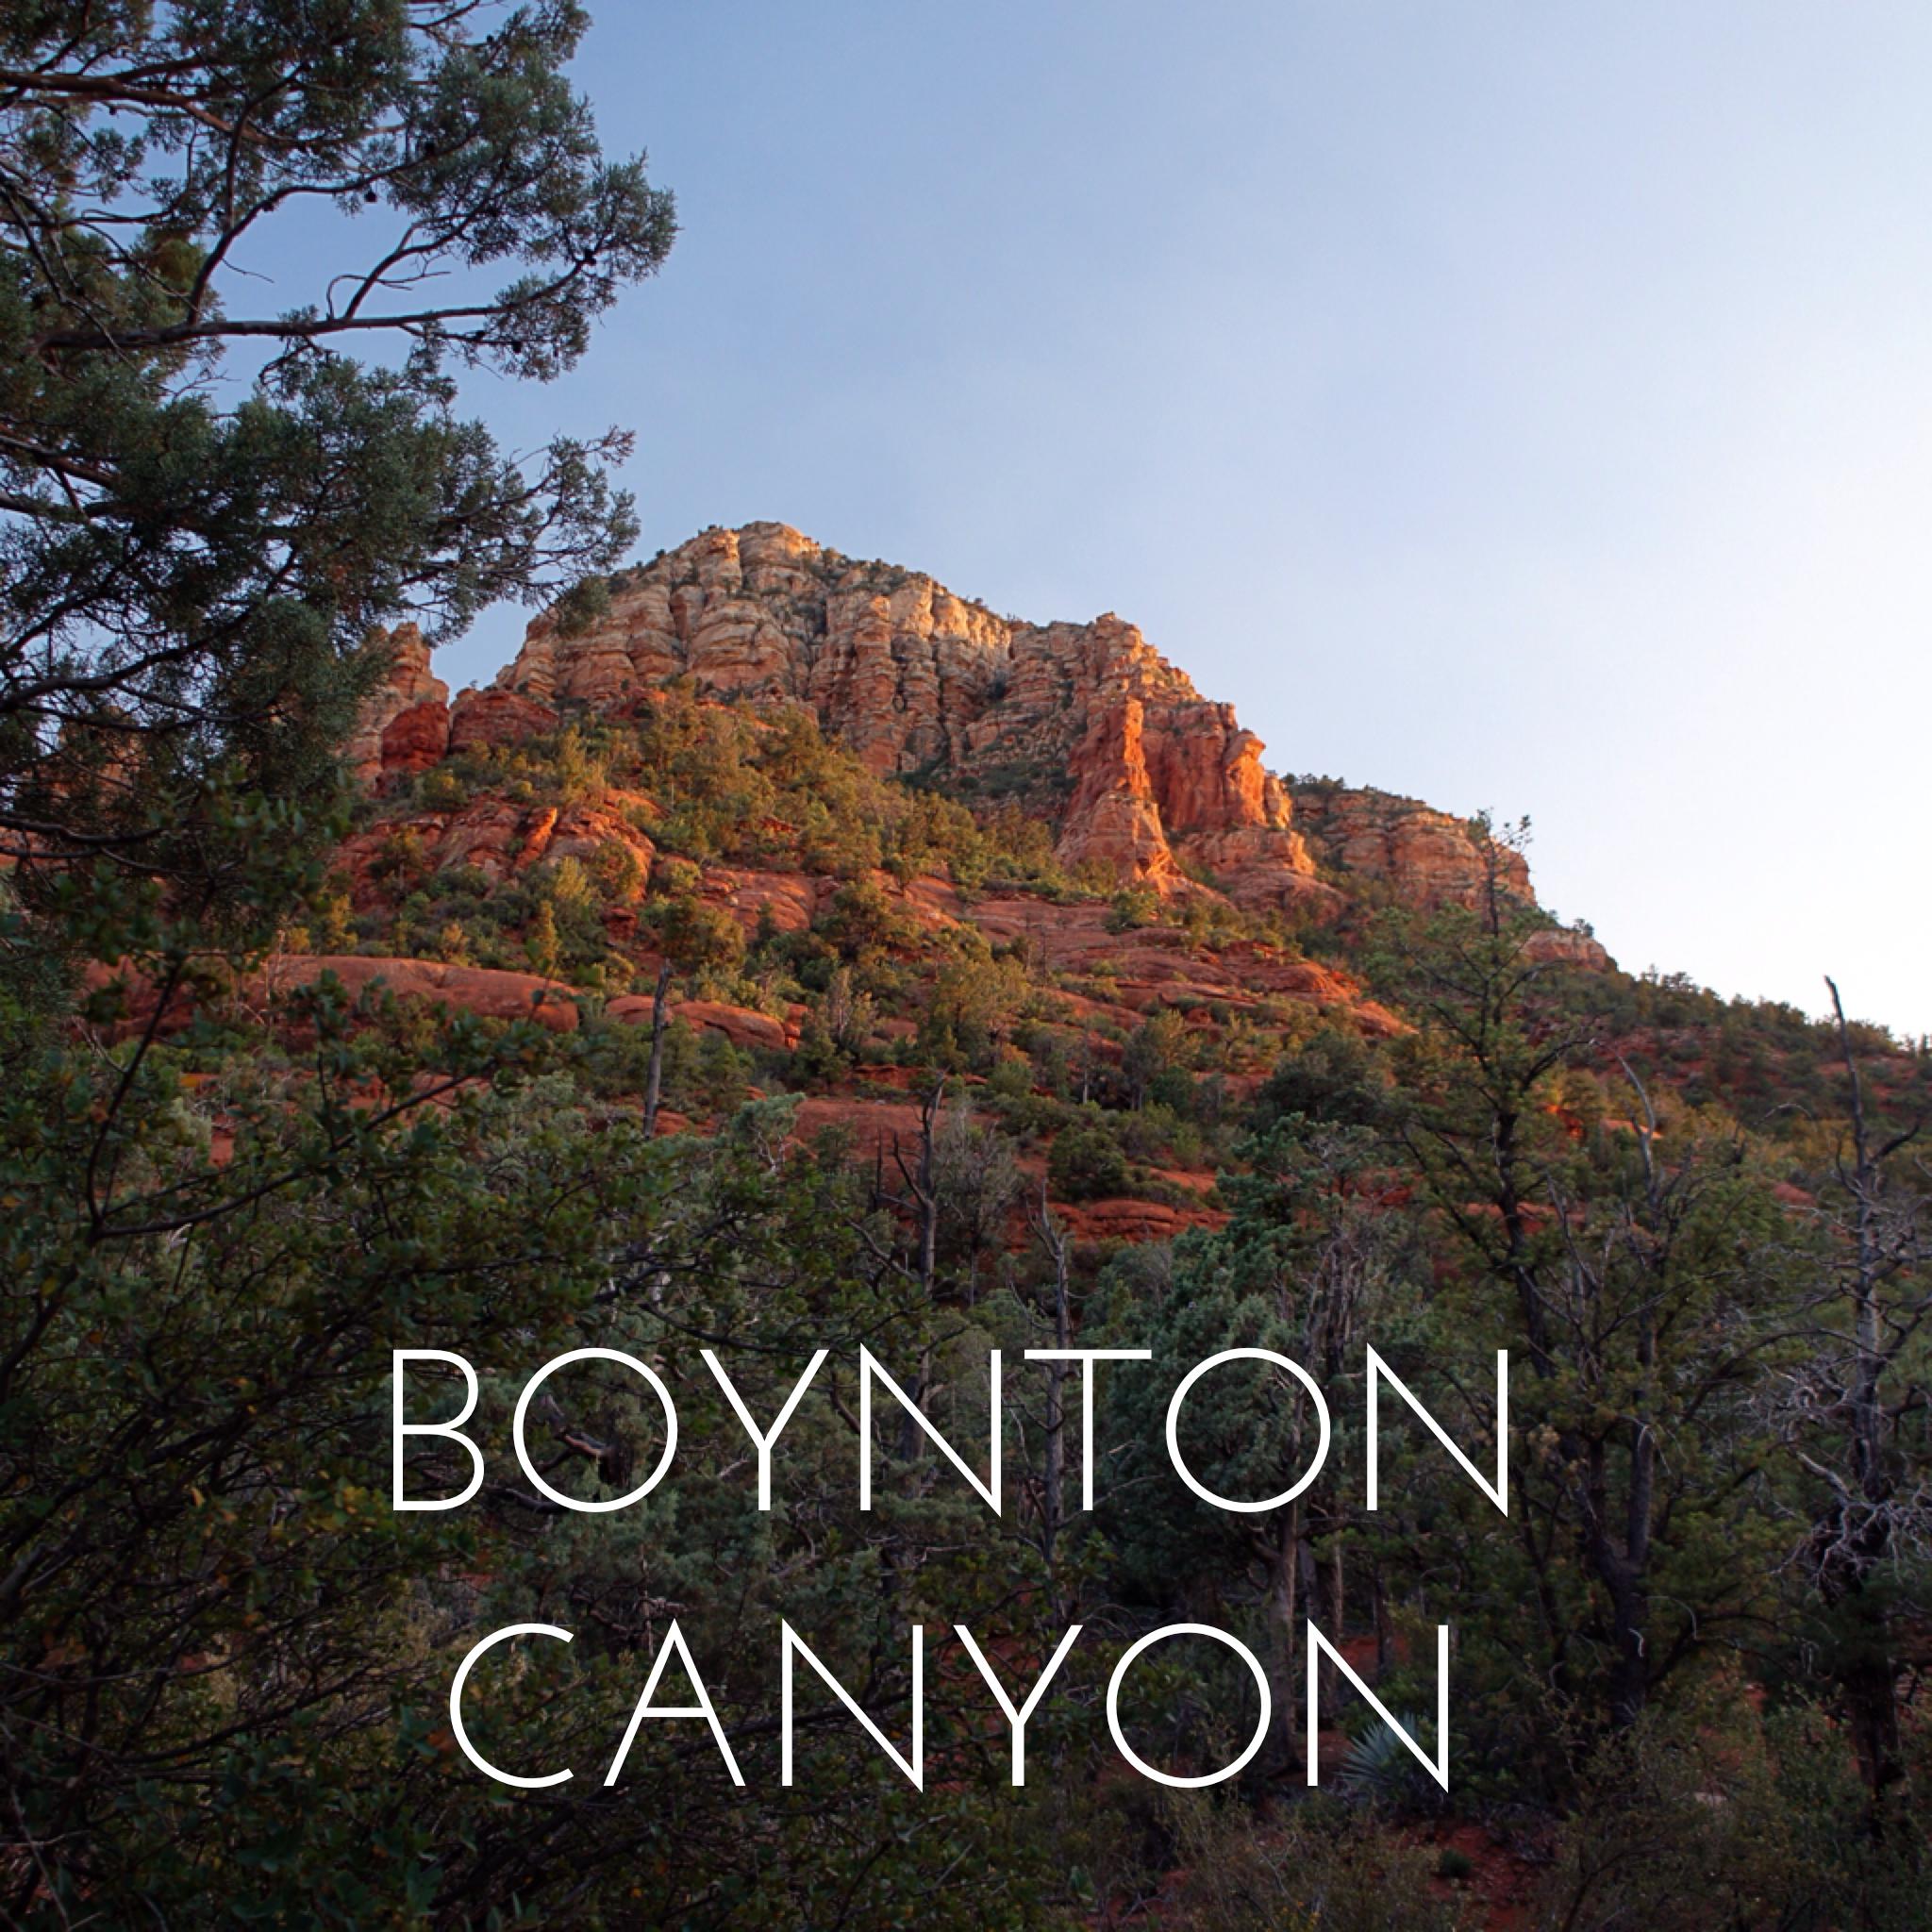 BoyntonCanyonTitle.jpg